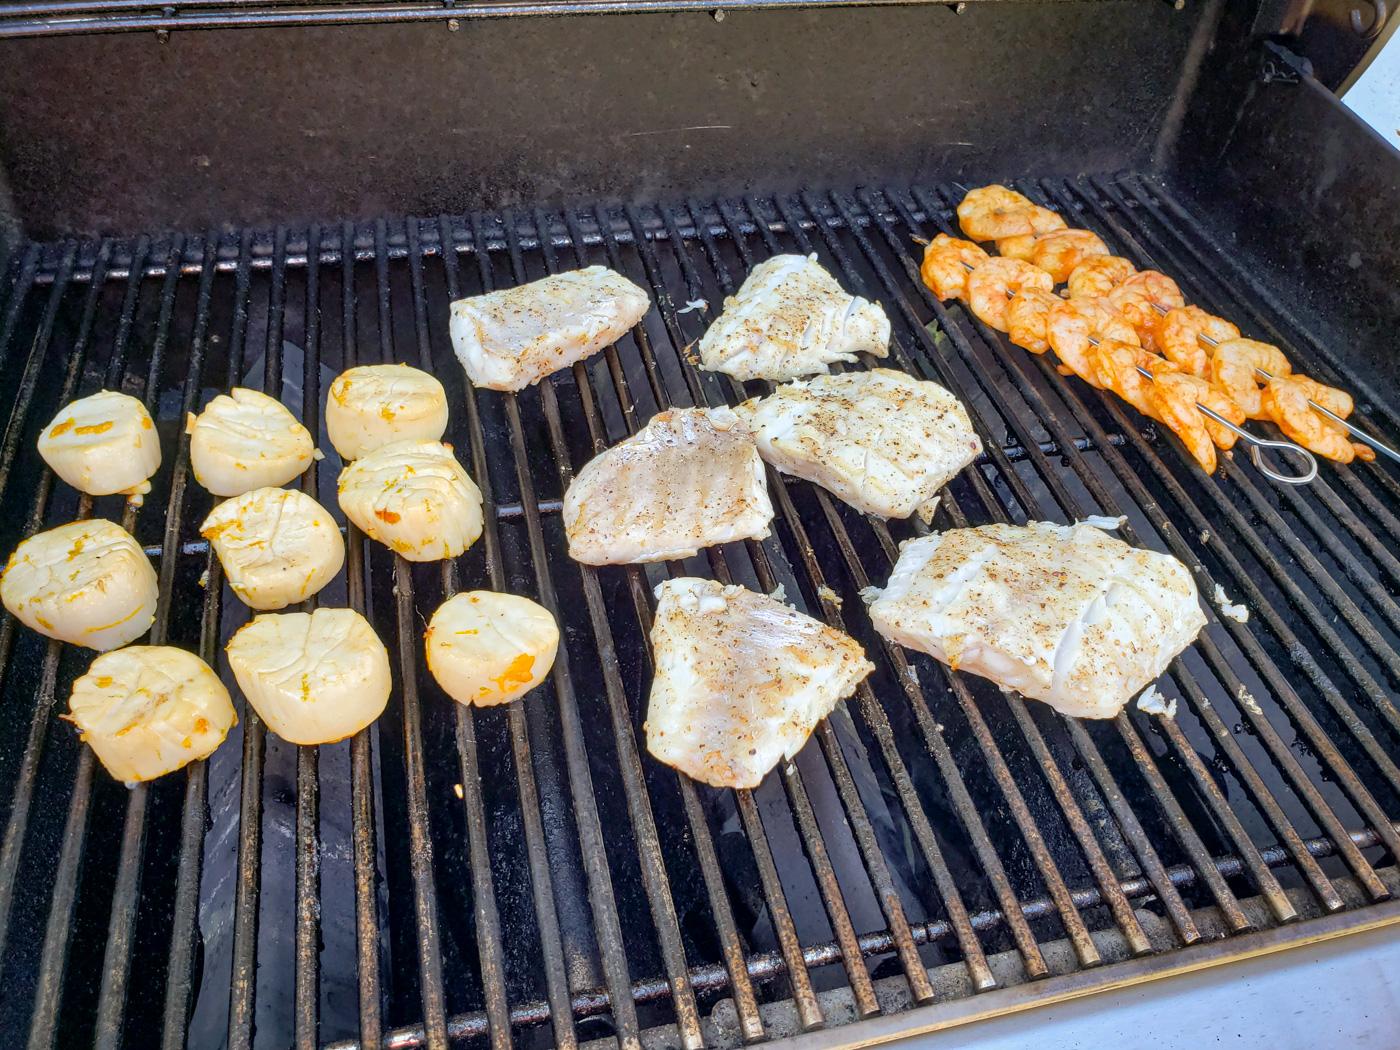 Grilling Scallops, Tilefish, and Shrimp